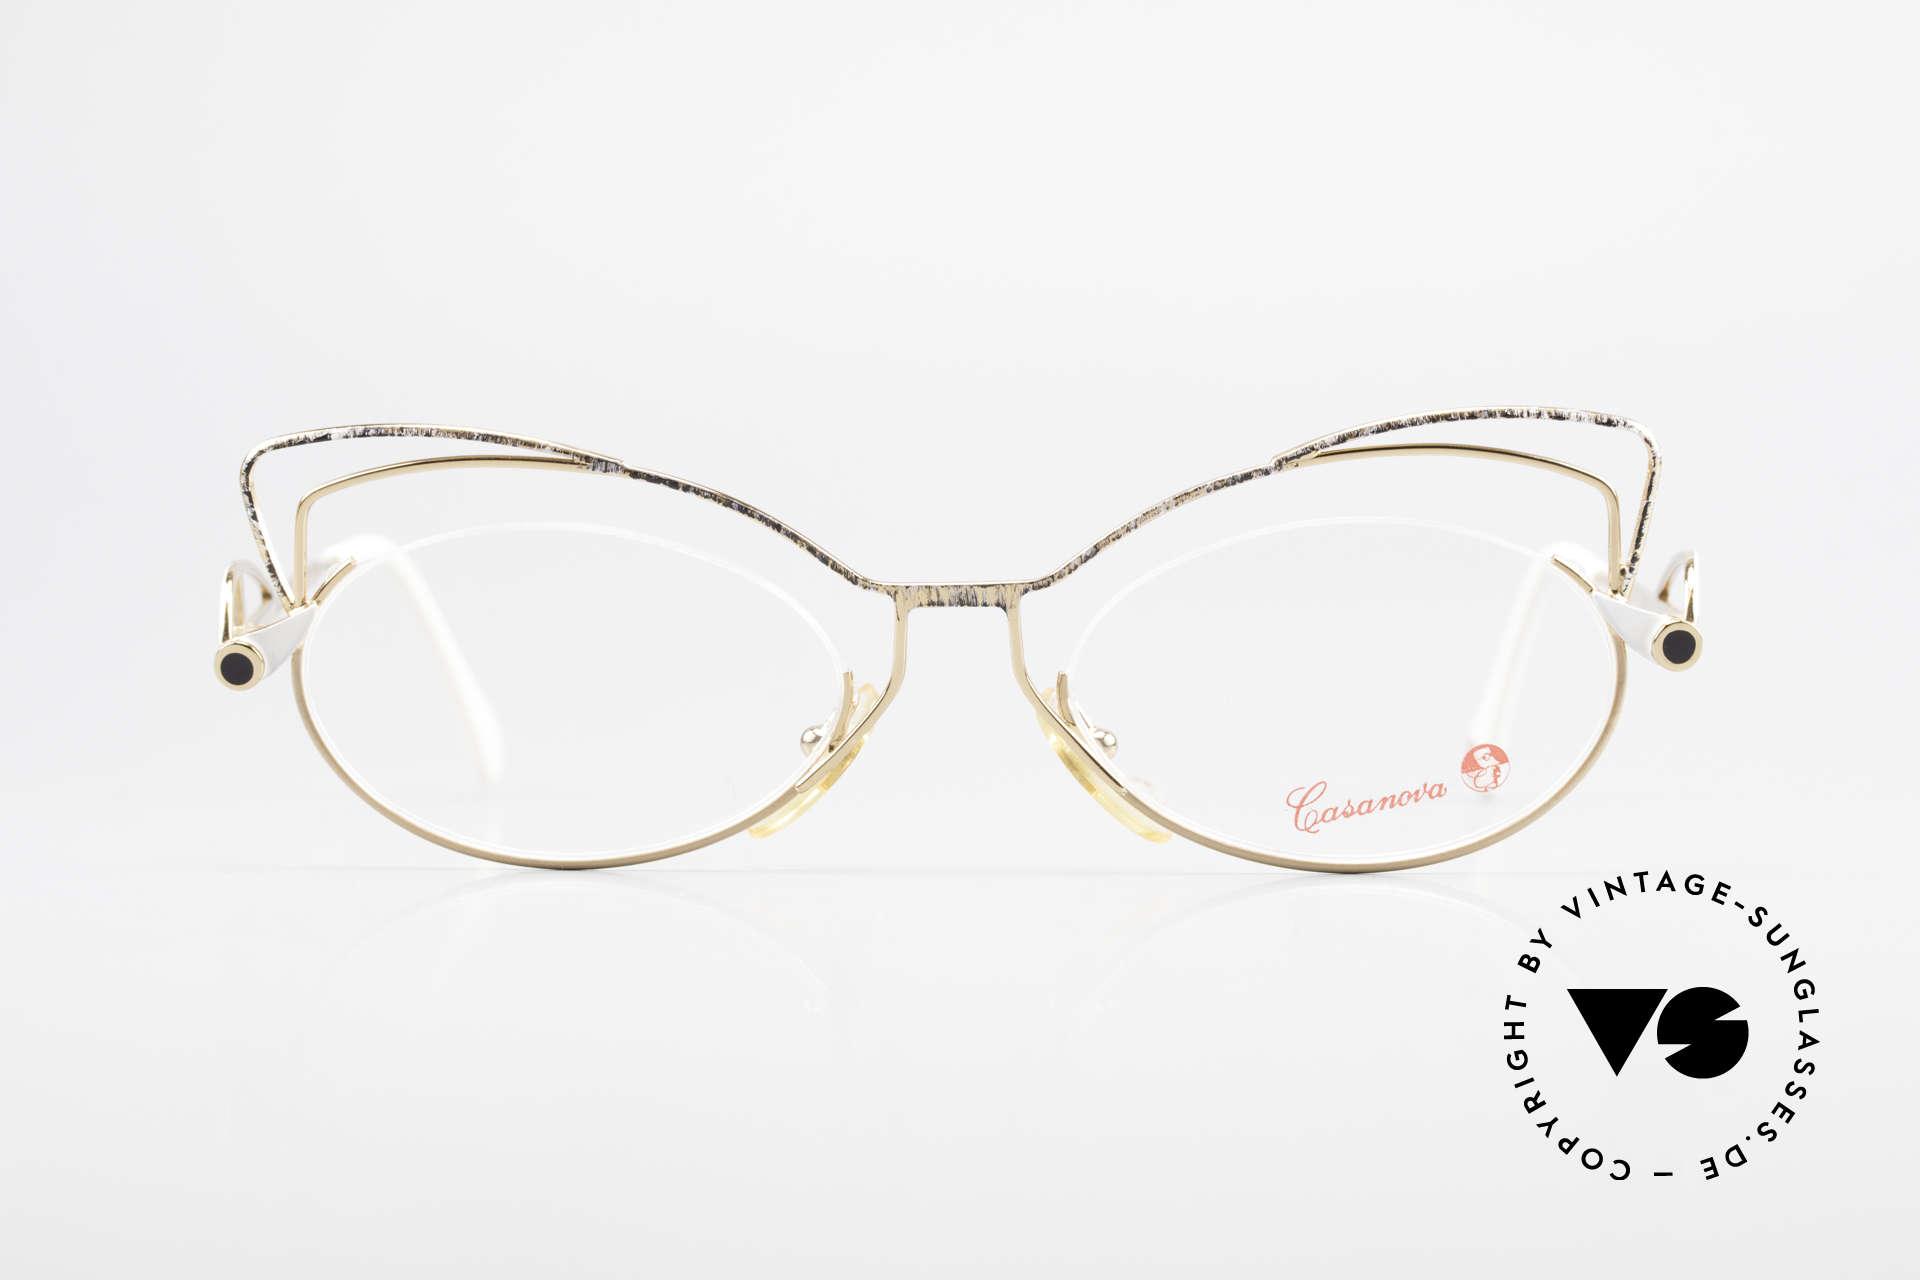 Casanova LC2 Enchanting Ladies Eyeglasses, fantastic combination of color, shape & functionality, Made for Women